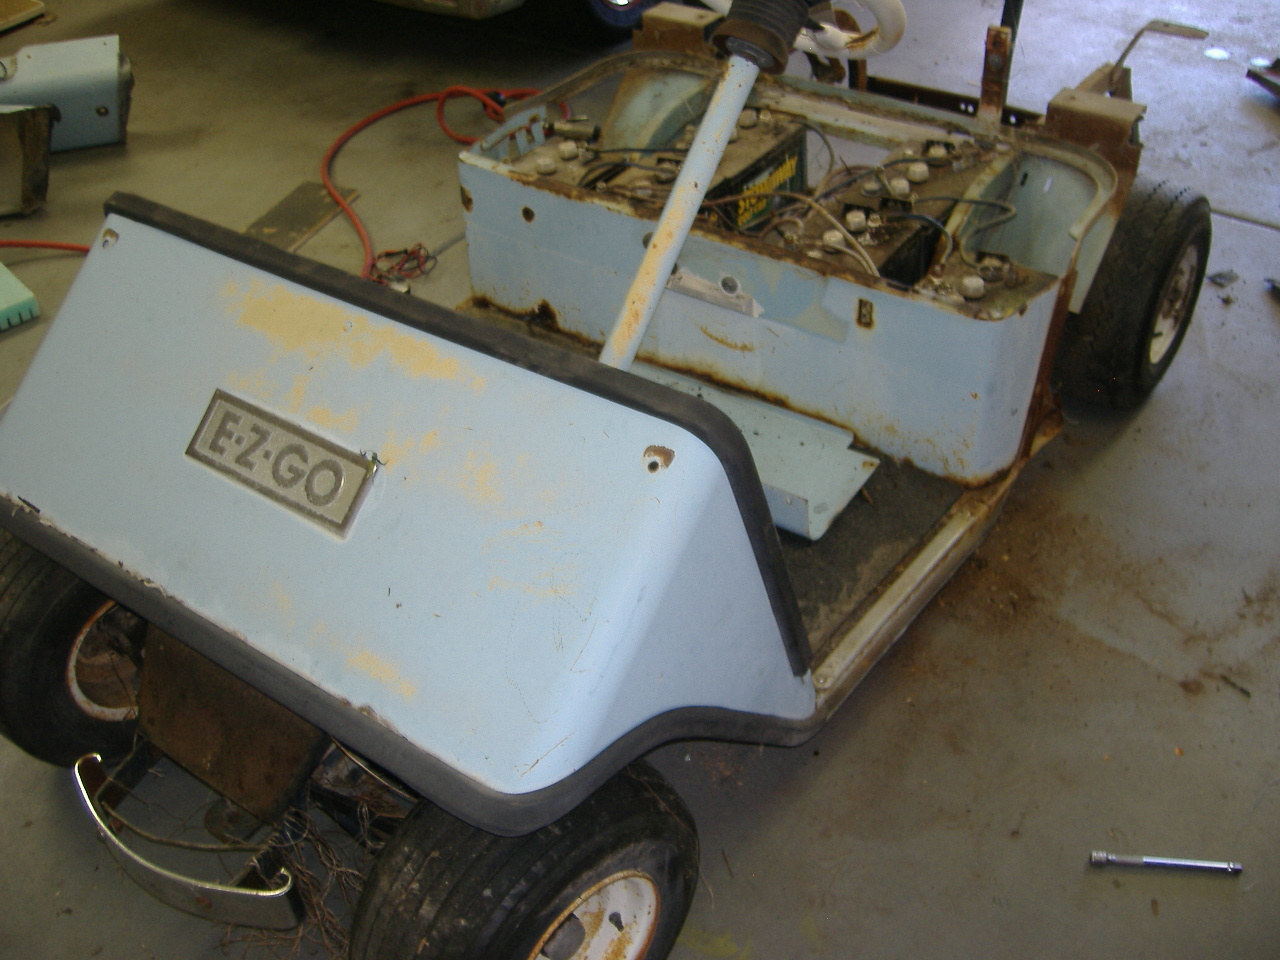 Cushman Electric Cart Troubleshootingwiring Problem Golf Vintage Ezgo Wiring Diagrams Gas Diagram For Batteries Automotive